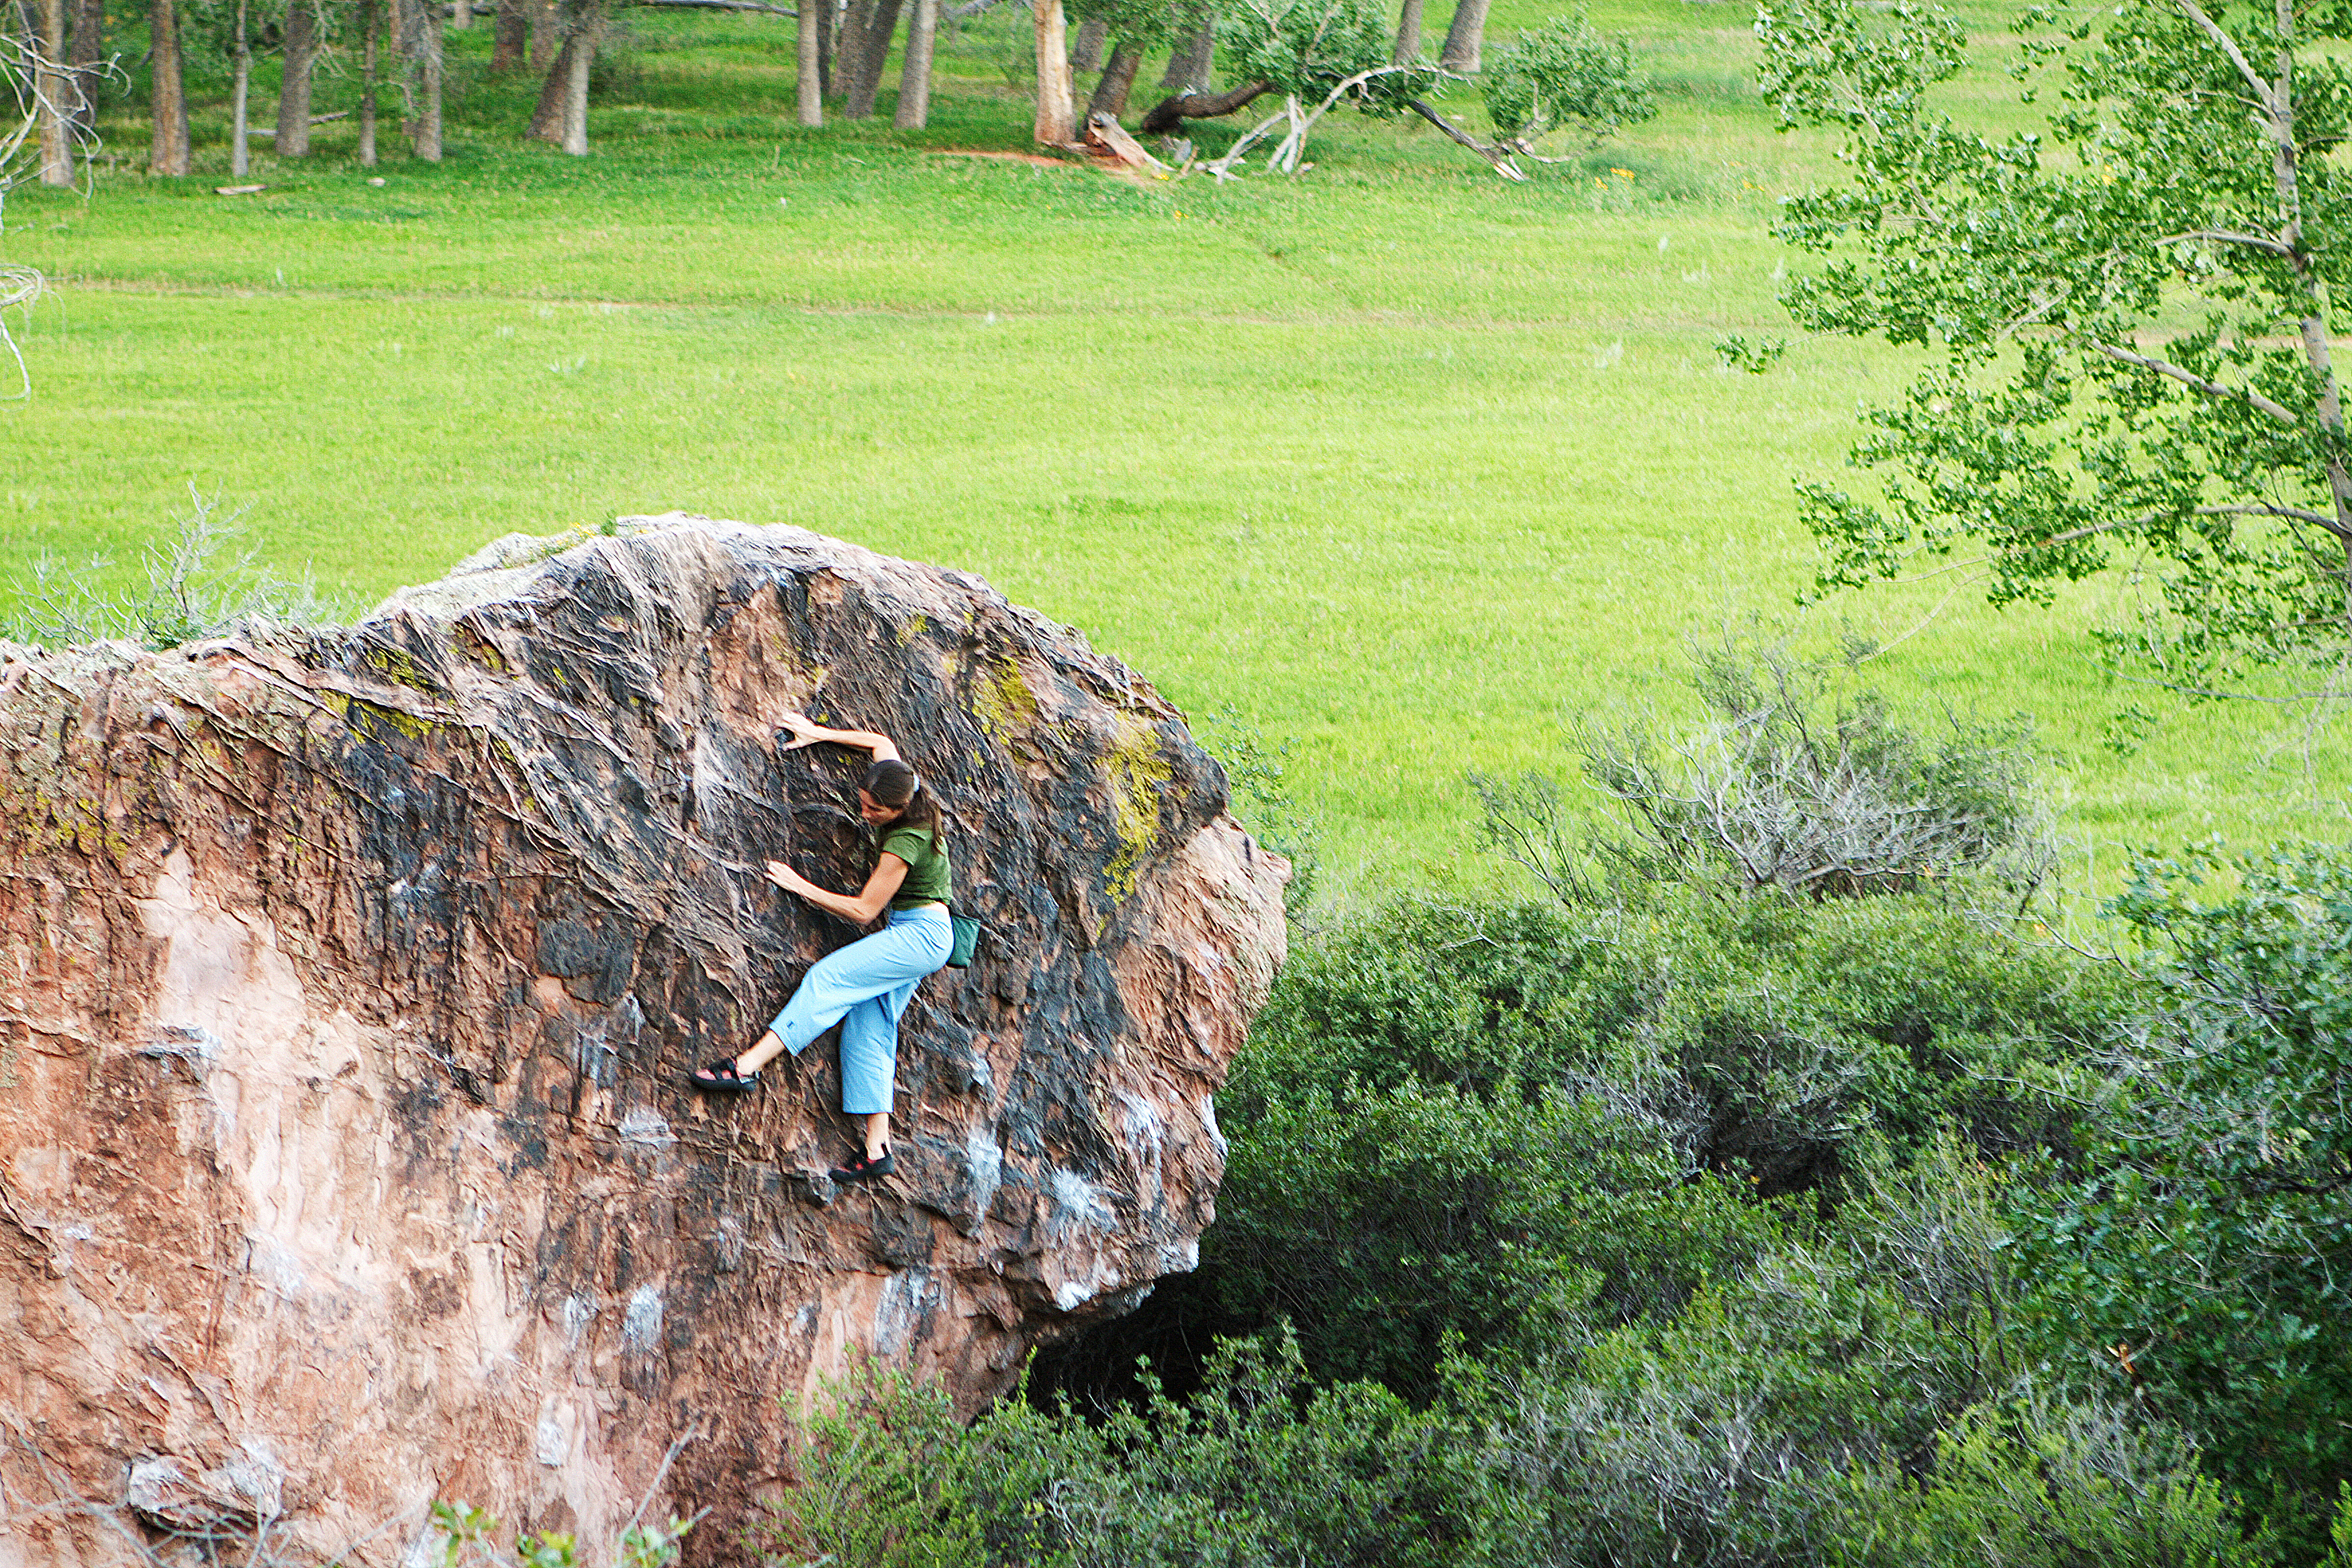 Bouldering the rock climber 39 s training manual - Garden of the gods rock climbing ...